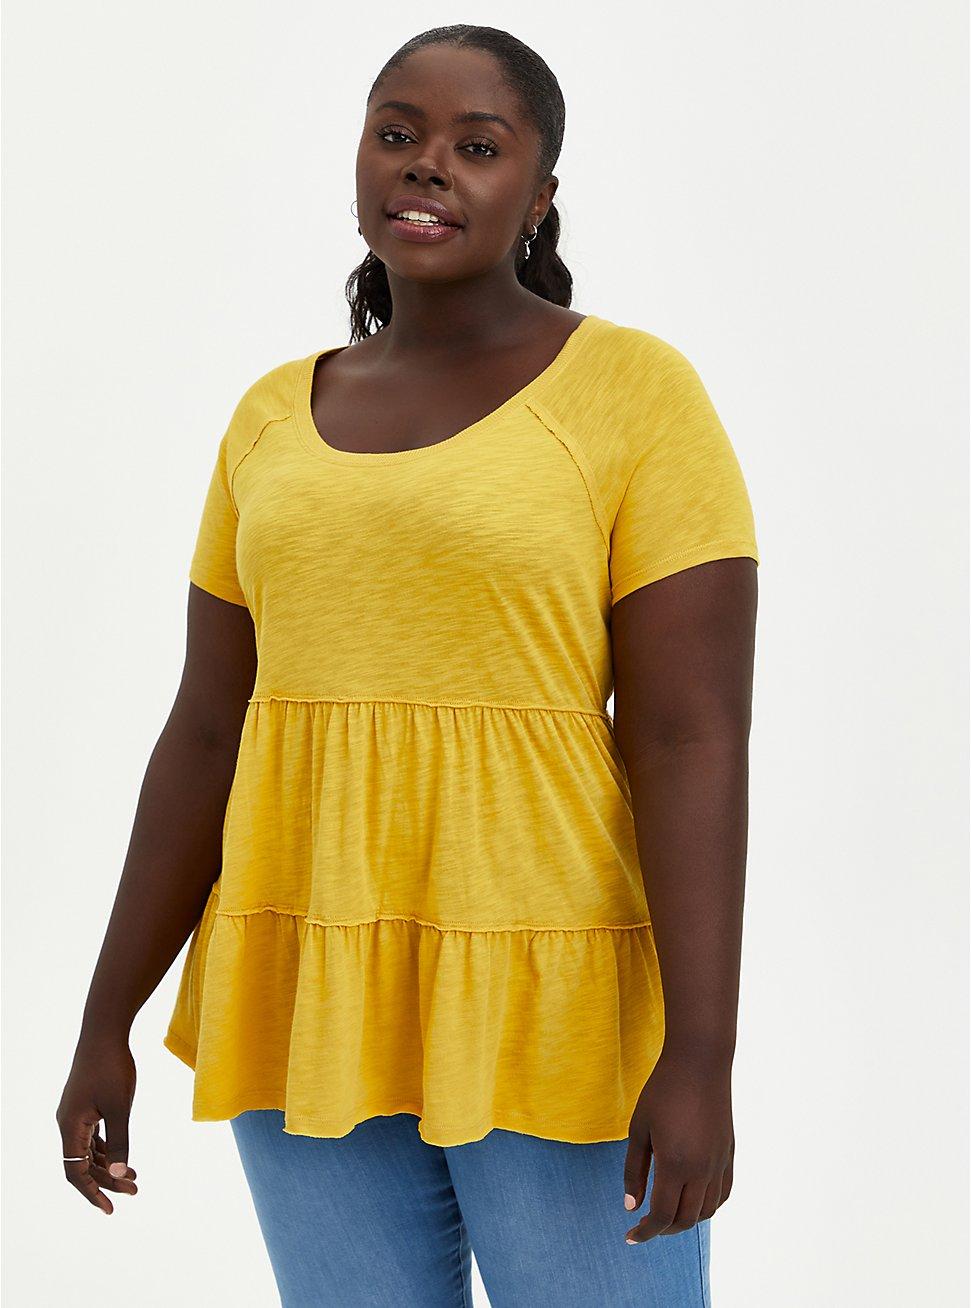 Tiered Babydoll Top - Mustard Yellow , MUSTARD HEATHER, hi-res